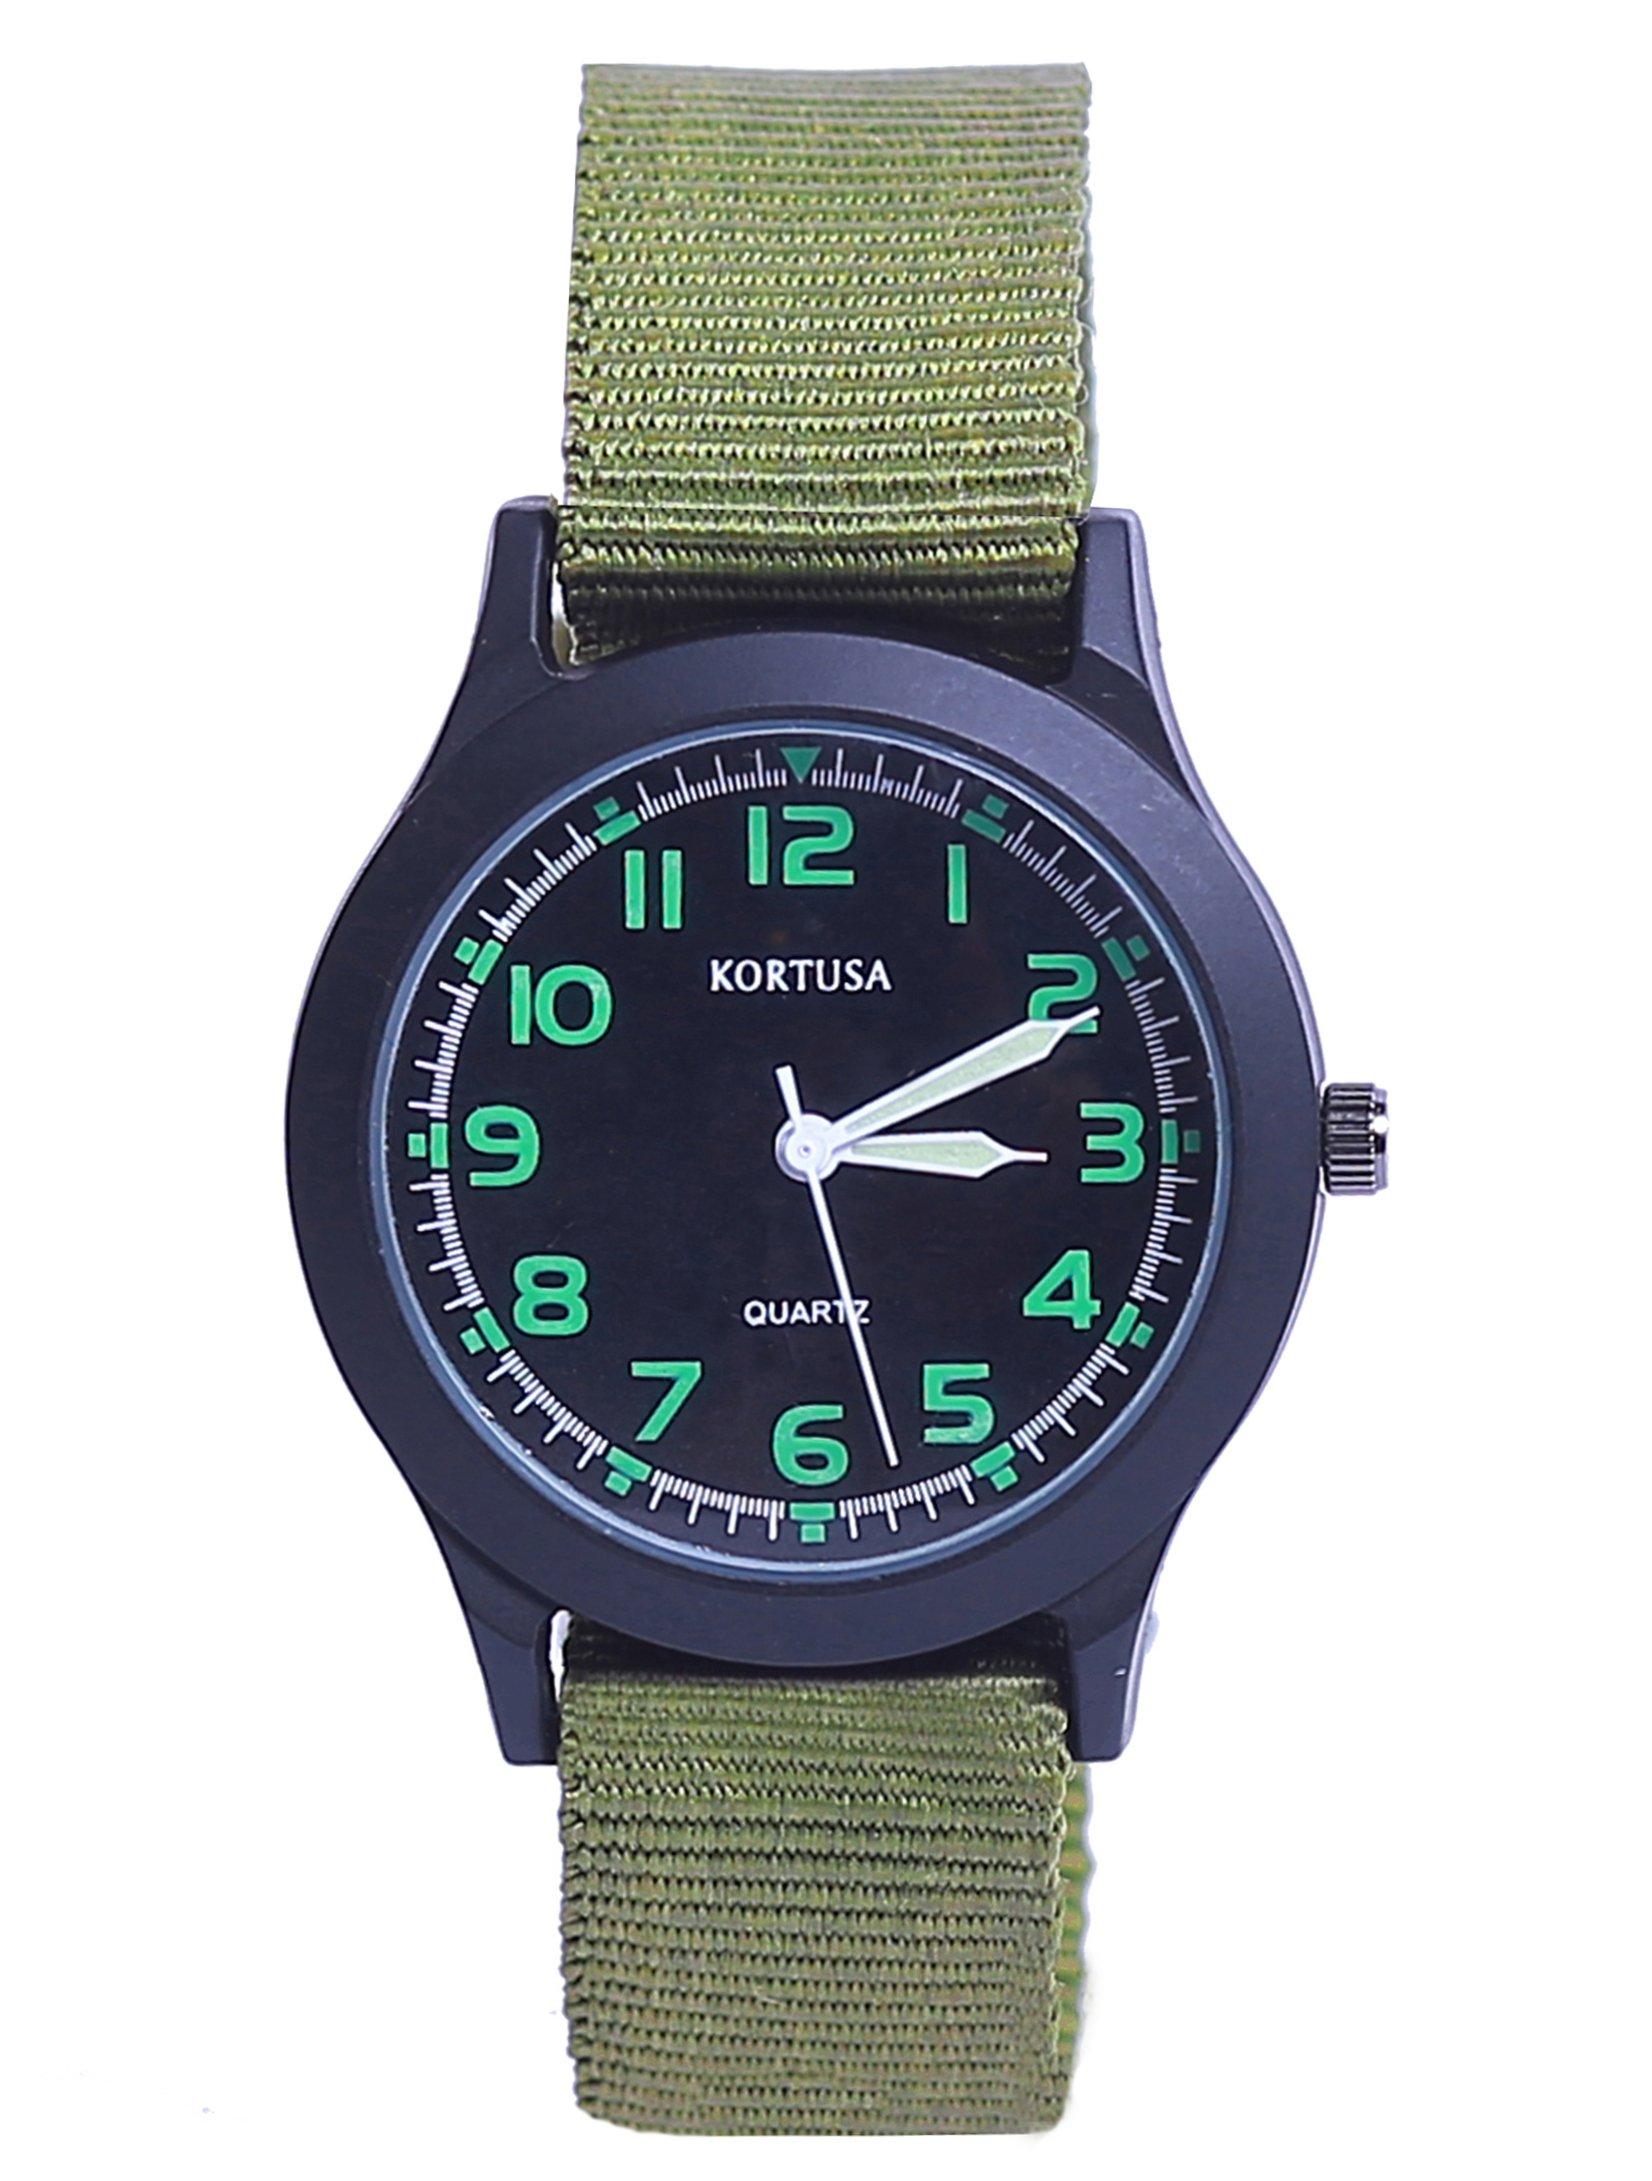 Kids Luminous Military Nylon Wrist Watch Boys Girls Waterproof Analog Quartz Watch with Adjustable Nylon Strap Green